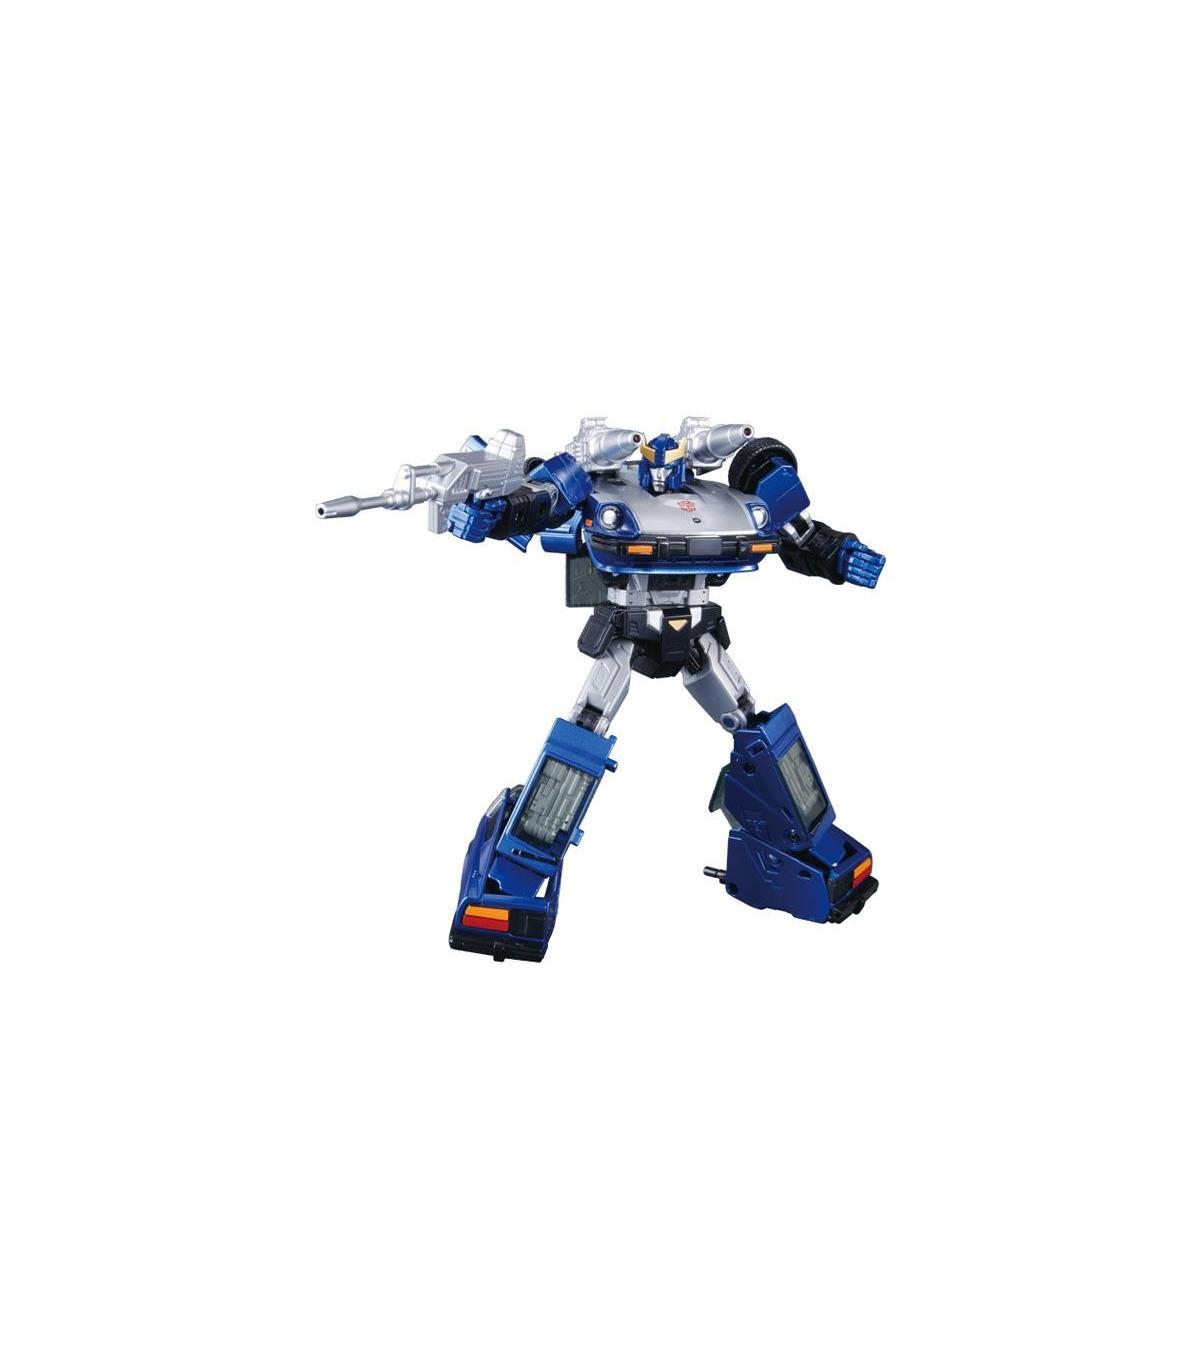 Takara TOMY Transformers Masterpiece MP 18   B Bluestreak Action Figure